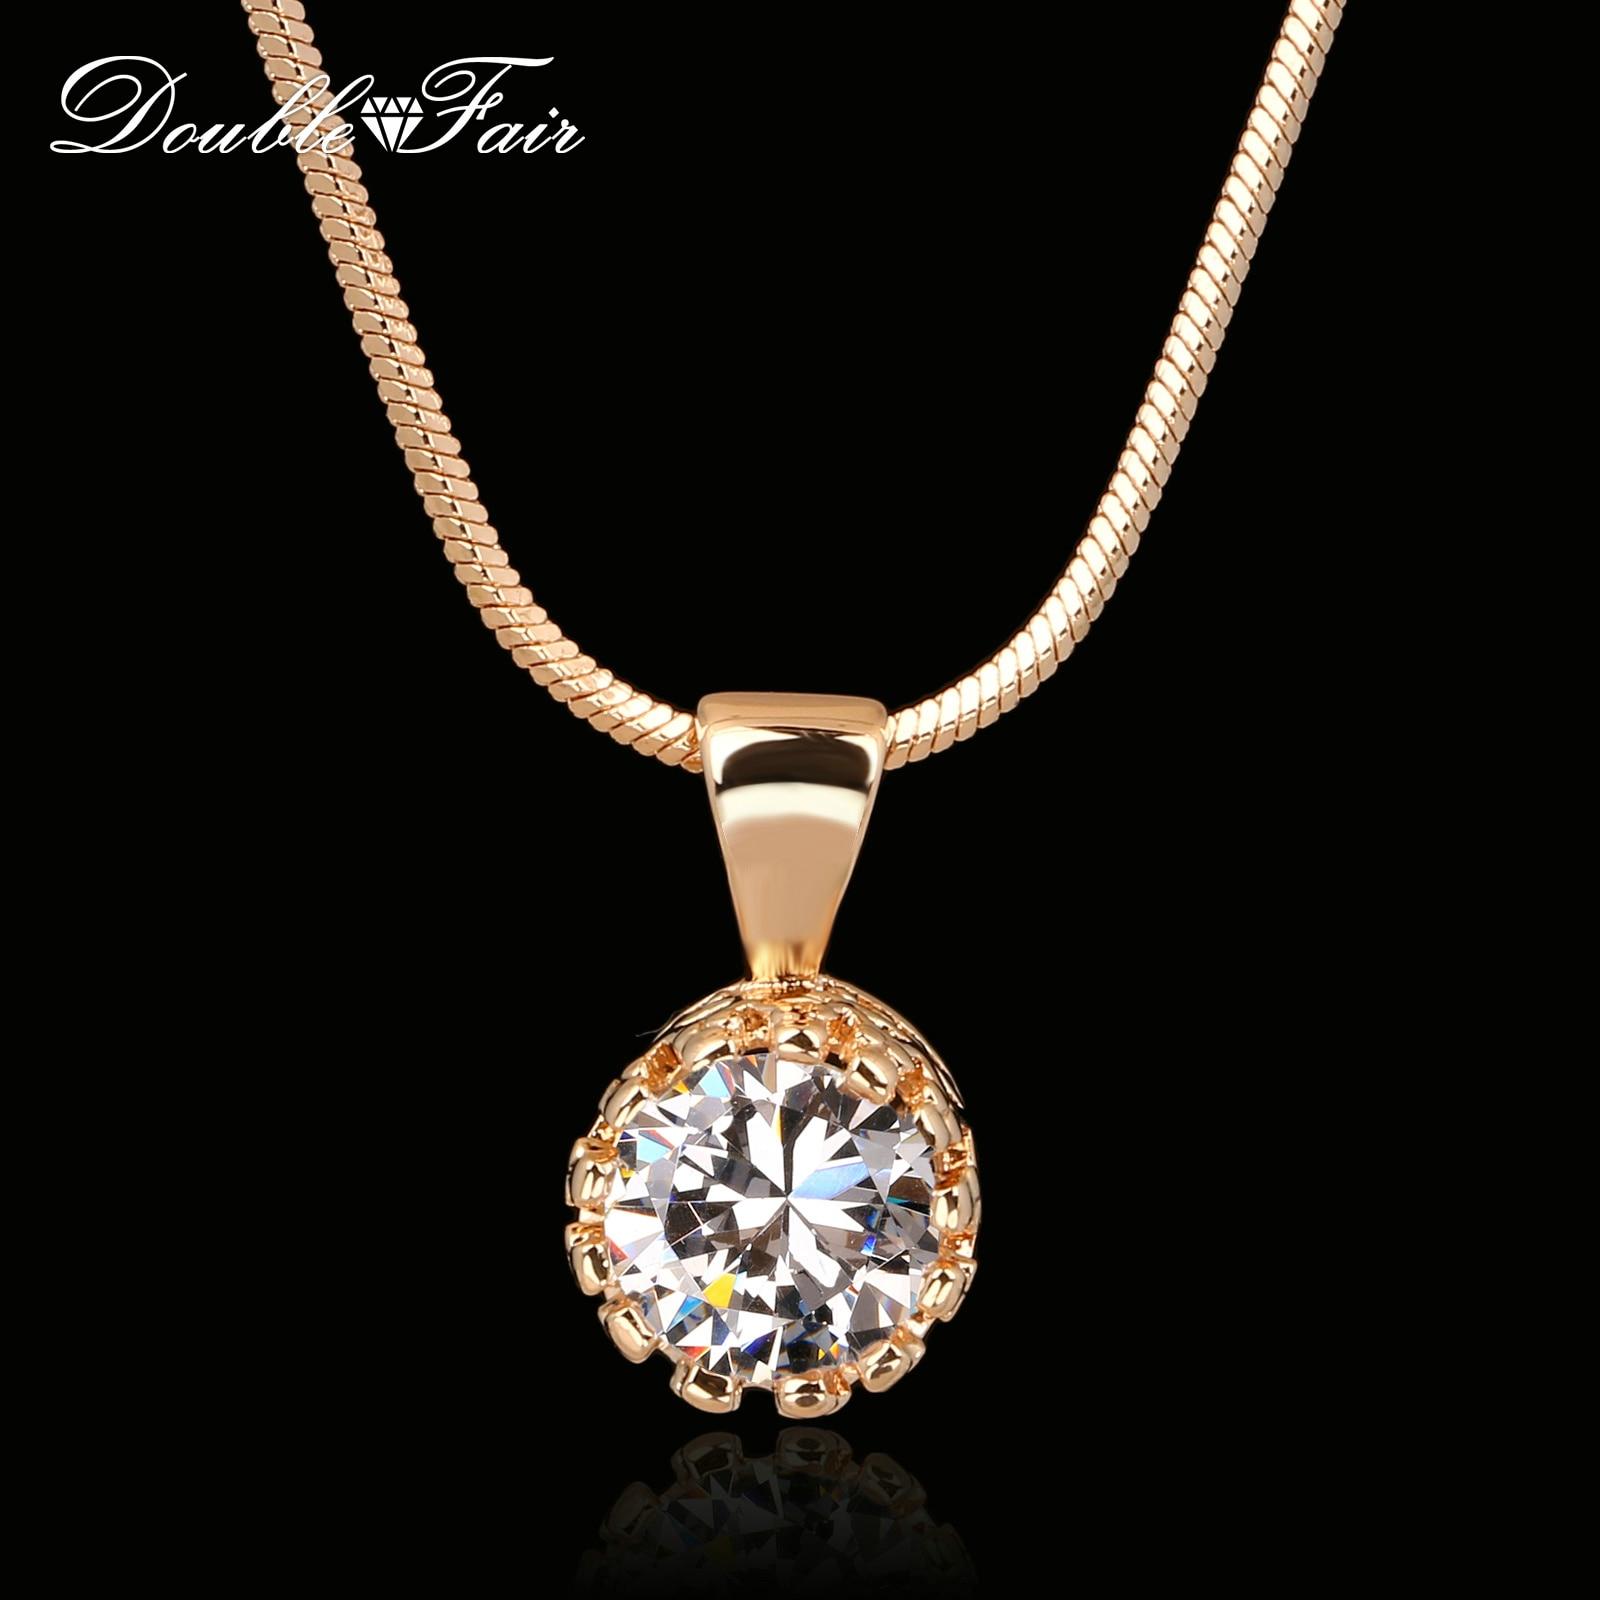 Ganda Adil Merek Unik Crown Cubic Zirconia Kalung Liontin & Silver Rose Gold Warna Rantai Fashion Perhiasan Untuk Wanita DFN390